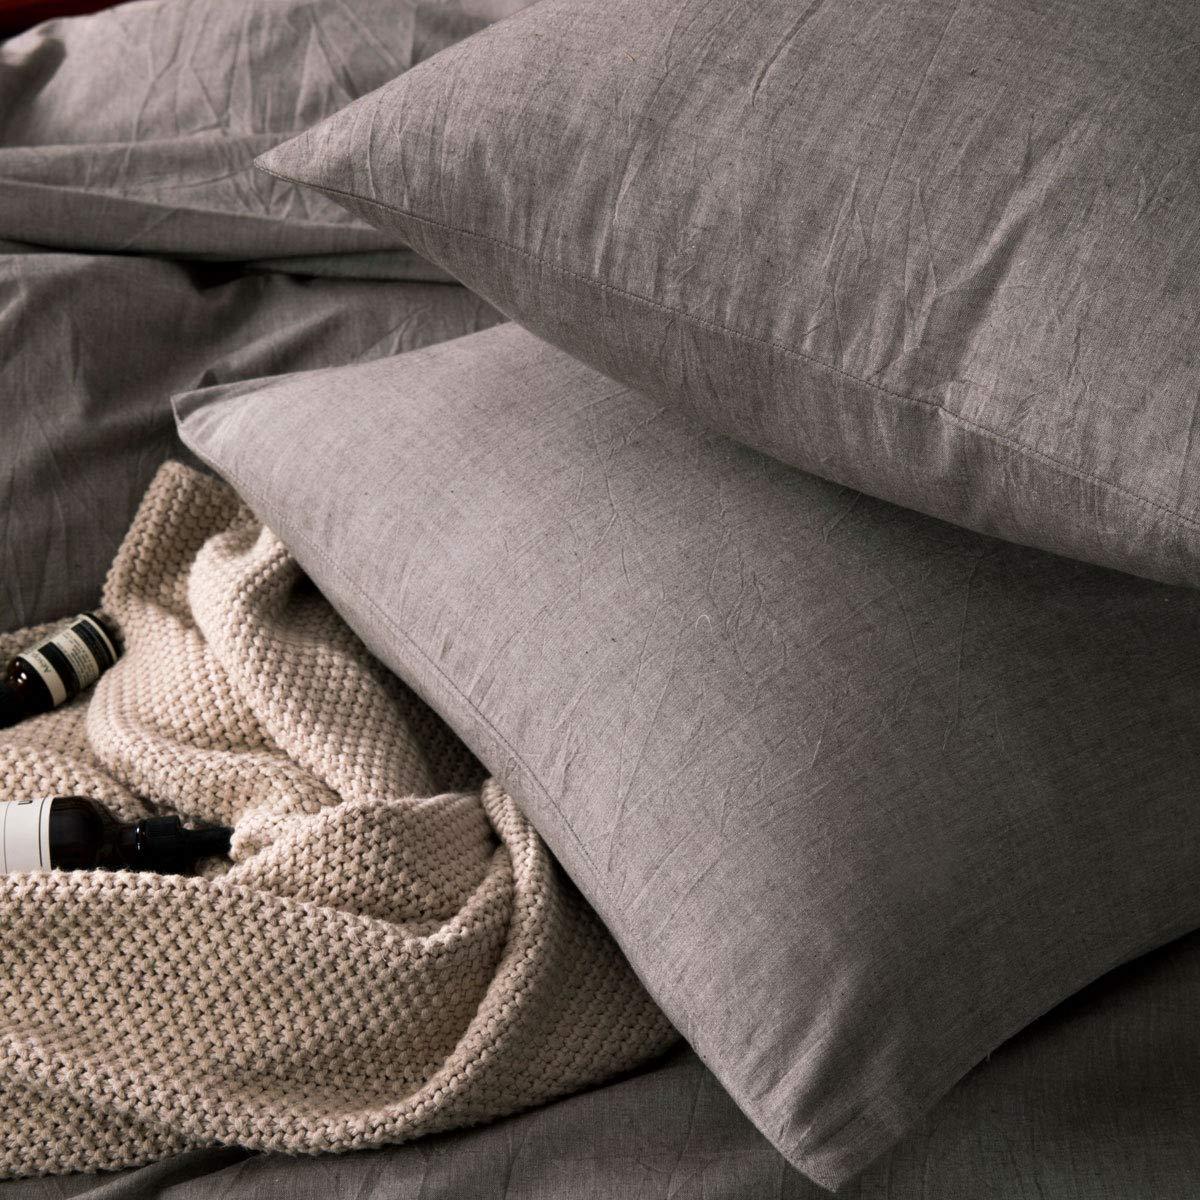 ATsense Duvet Cover Sets, 100% Washed Cotton, Queen 3-Piece Bedding Duvet Cover, Simple Style Farmhouse Bedding Set (Grey 7063) by ATsense (Image #3)